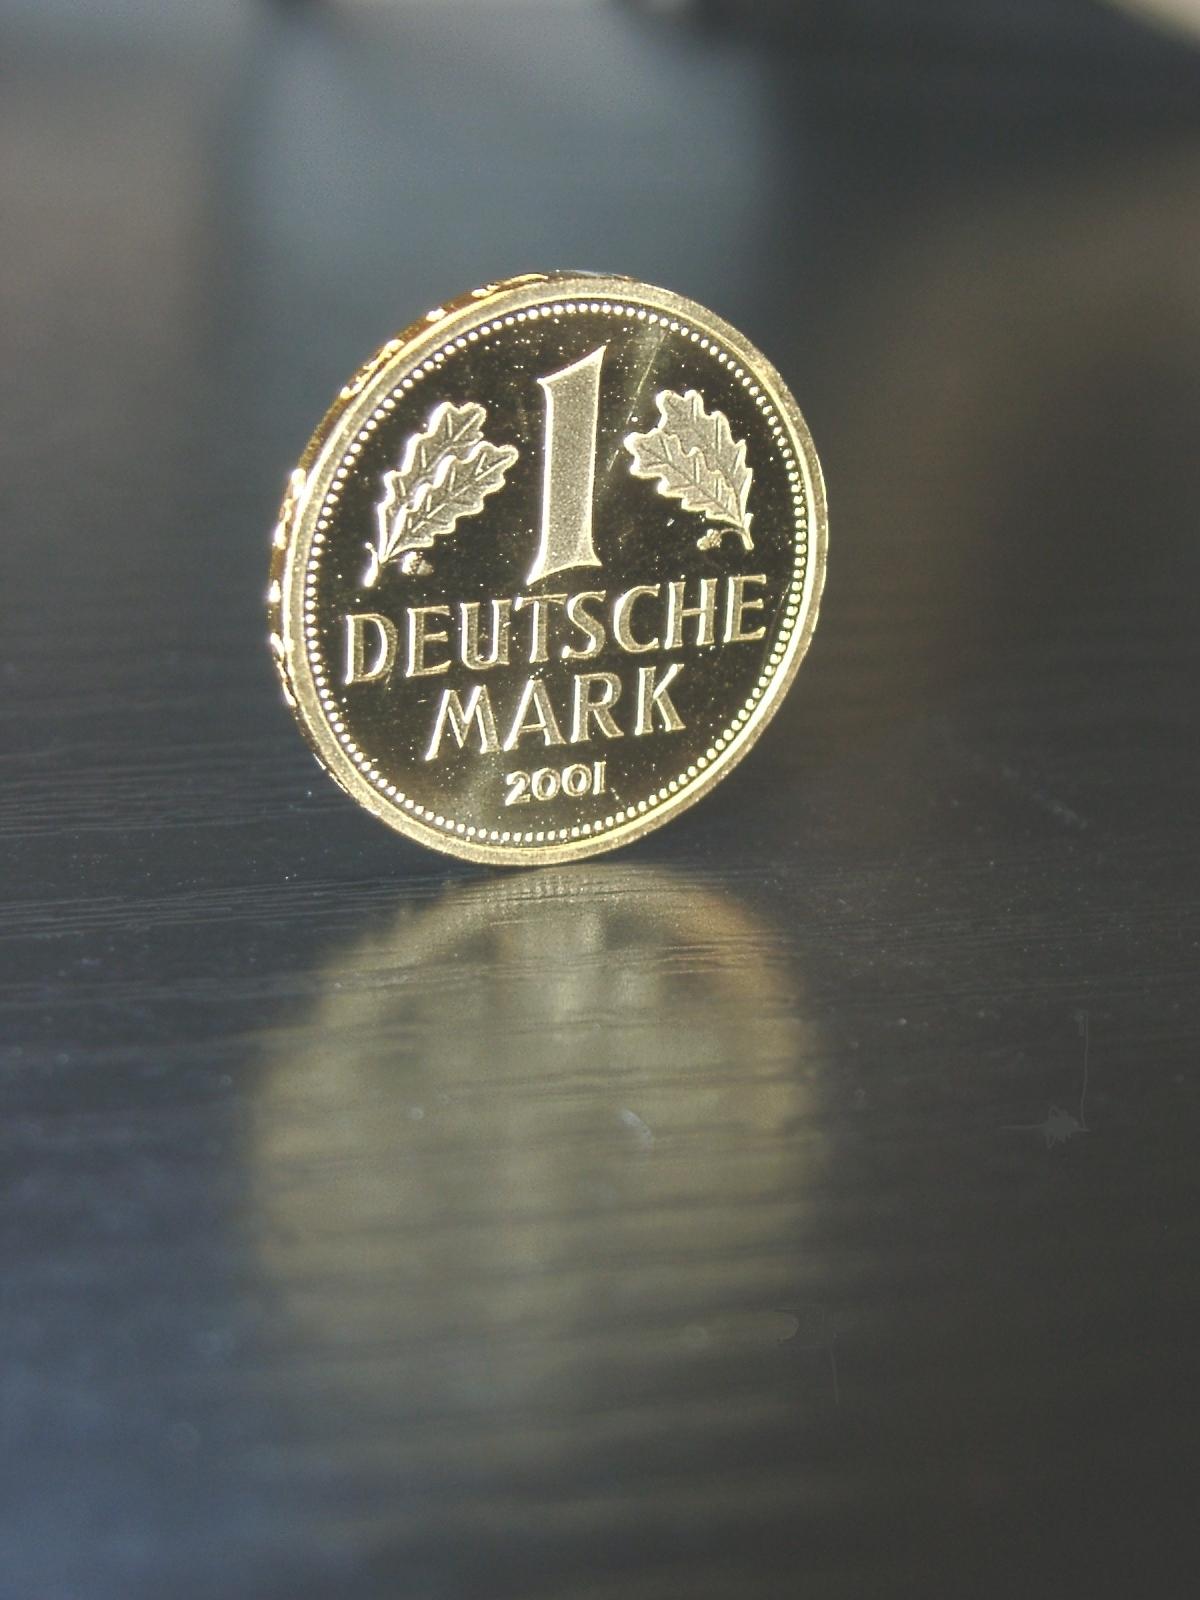 Filedeutsche markgold 2001g wikimedia commons filedeutsche markgold 2001g buycottarizona